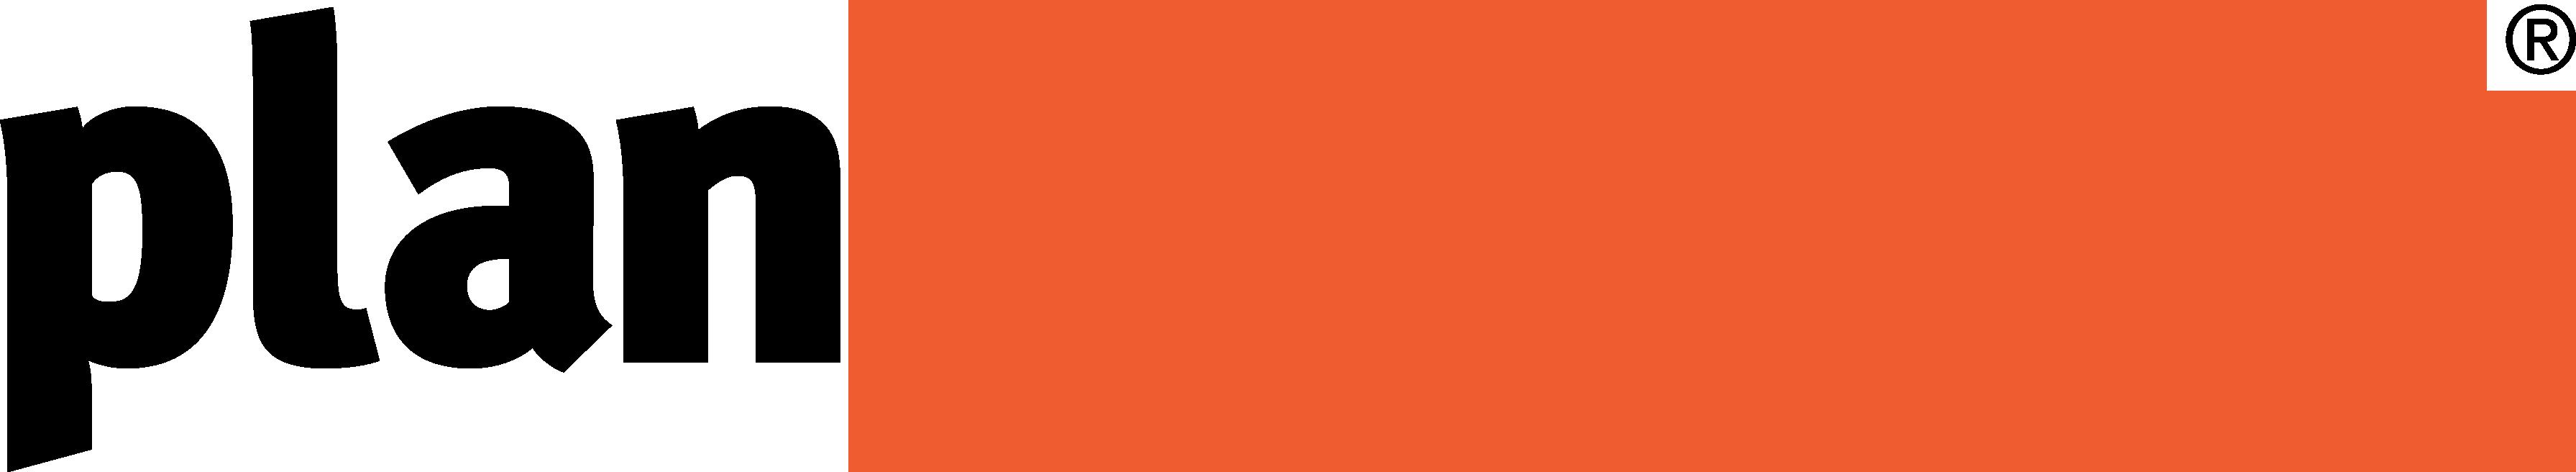 planbuilding-logo-black-orange